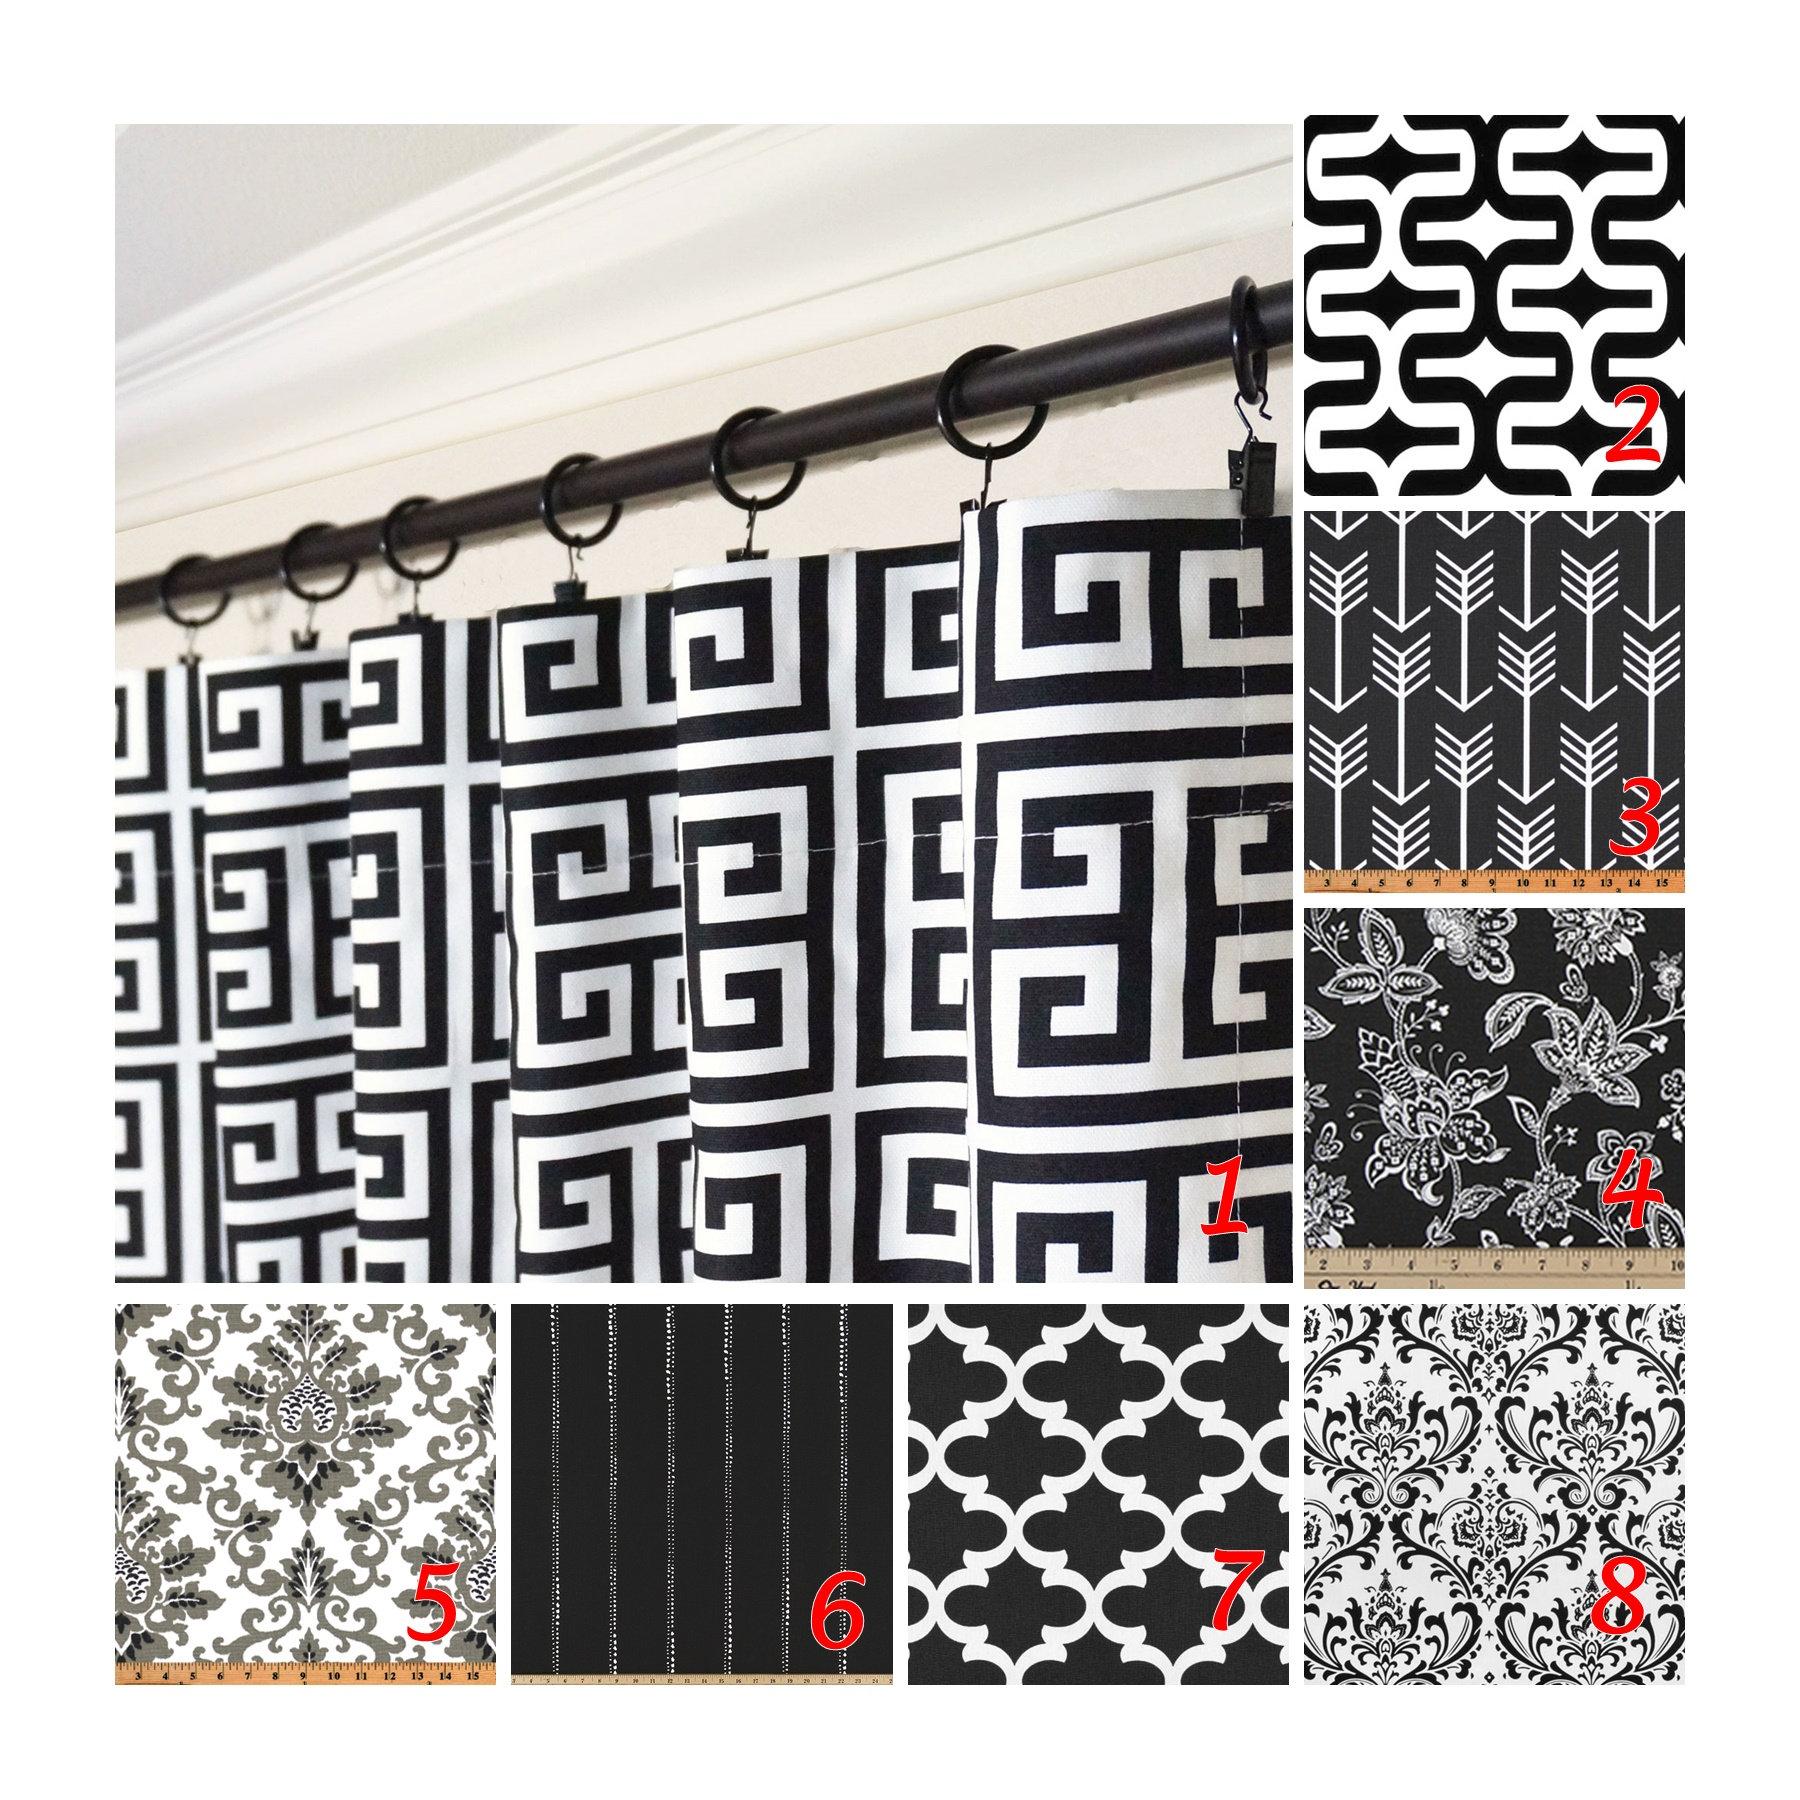 Fenster Curtains.Black White Curtains.Greek Key Curtain Panels.Arrow  Curtains.Black White Kitchen Curtain.Geometric Drapery Panel